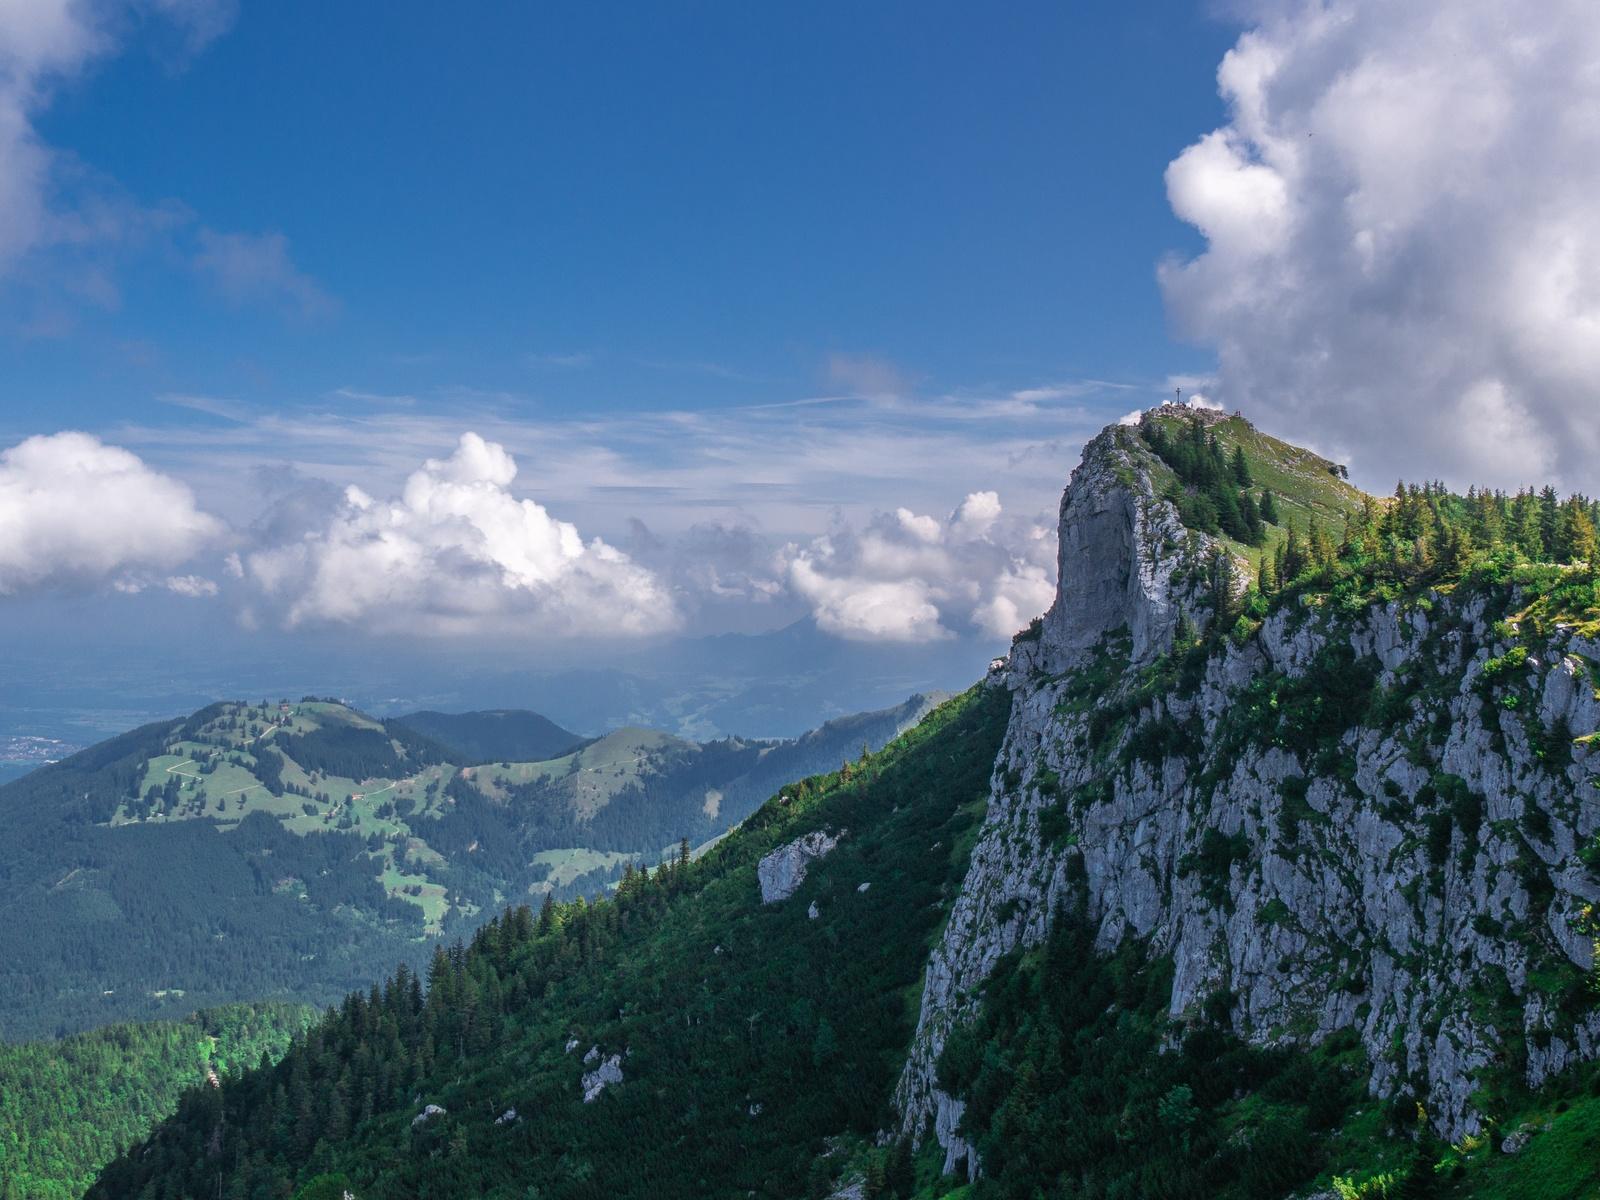 пейзаж, небо, облака, горы, бавария